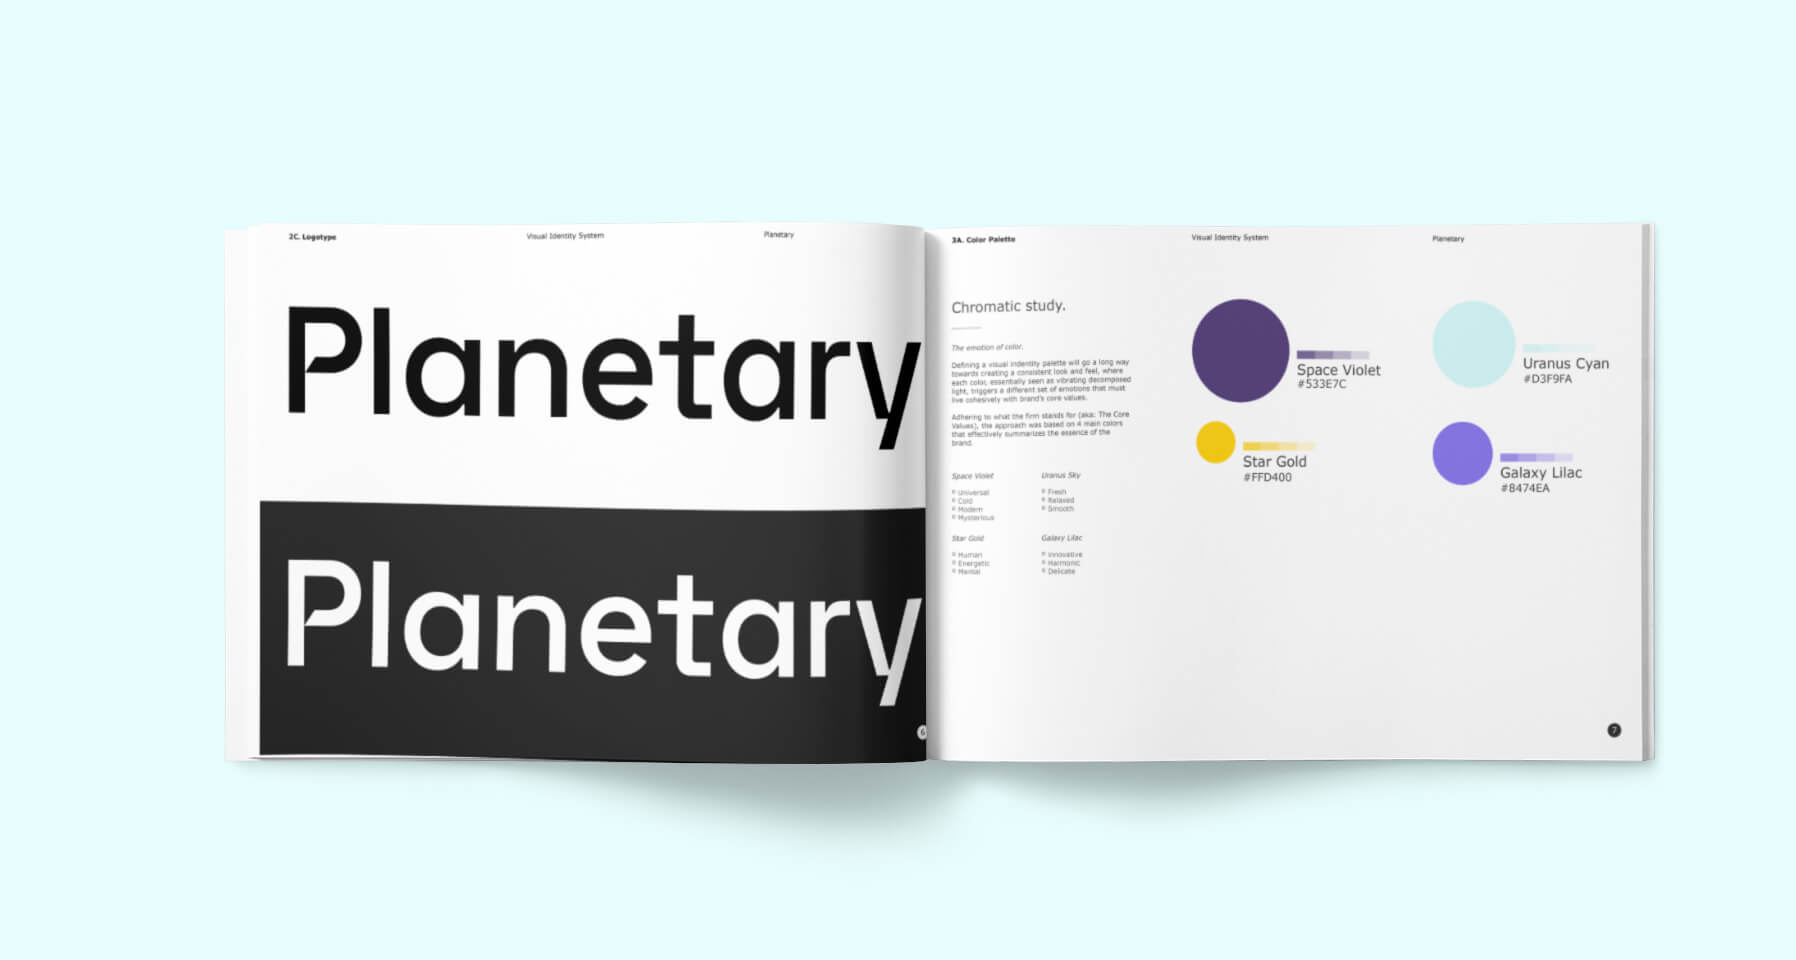 Planetary Chromatic Study -  Estudio cromatico planetary